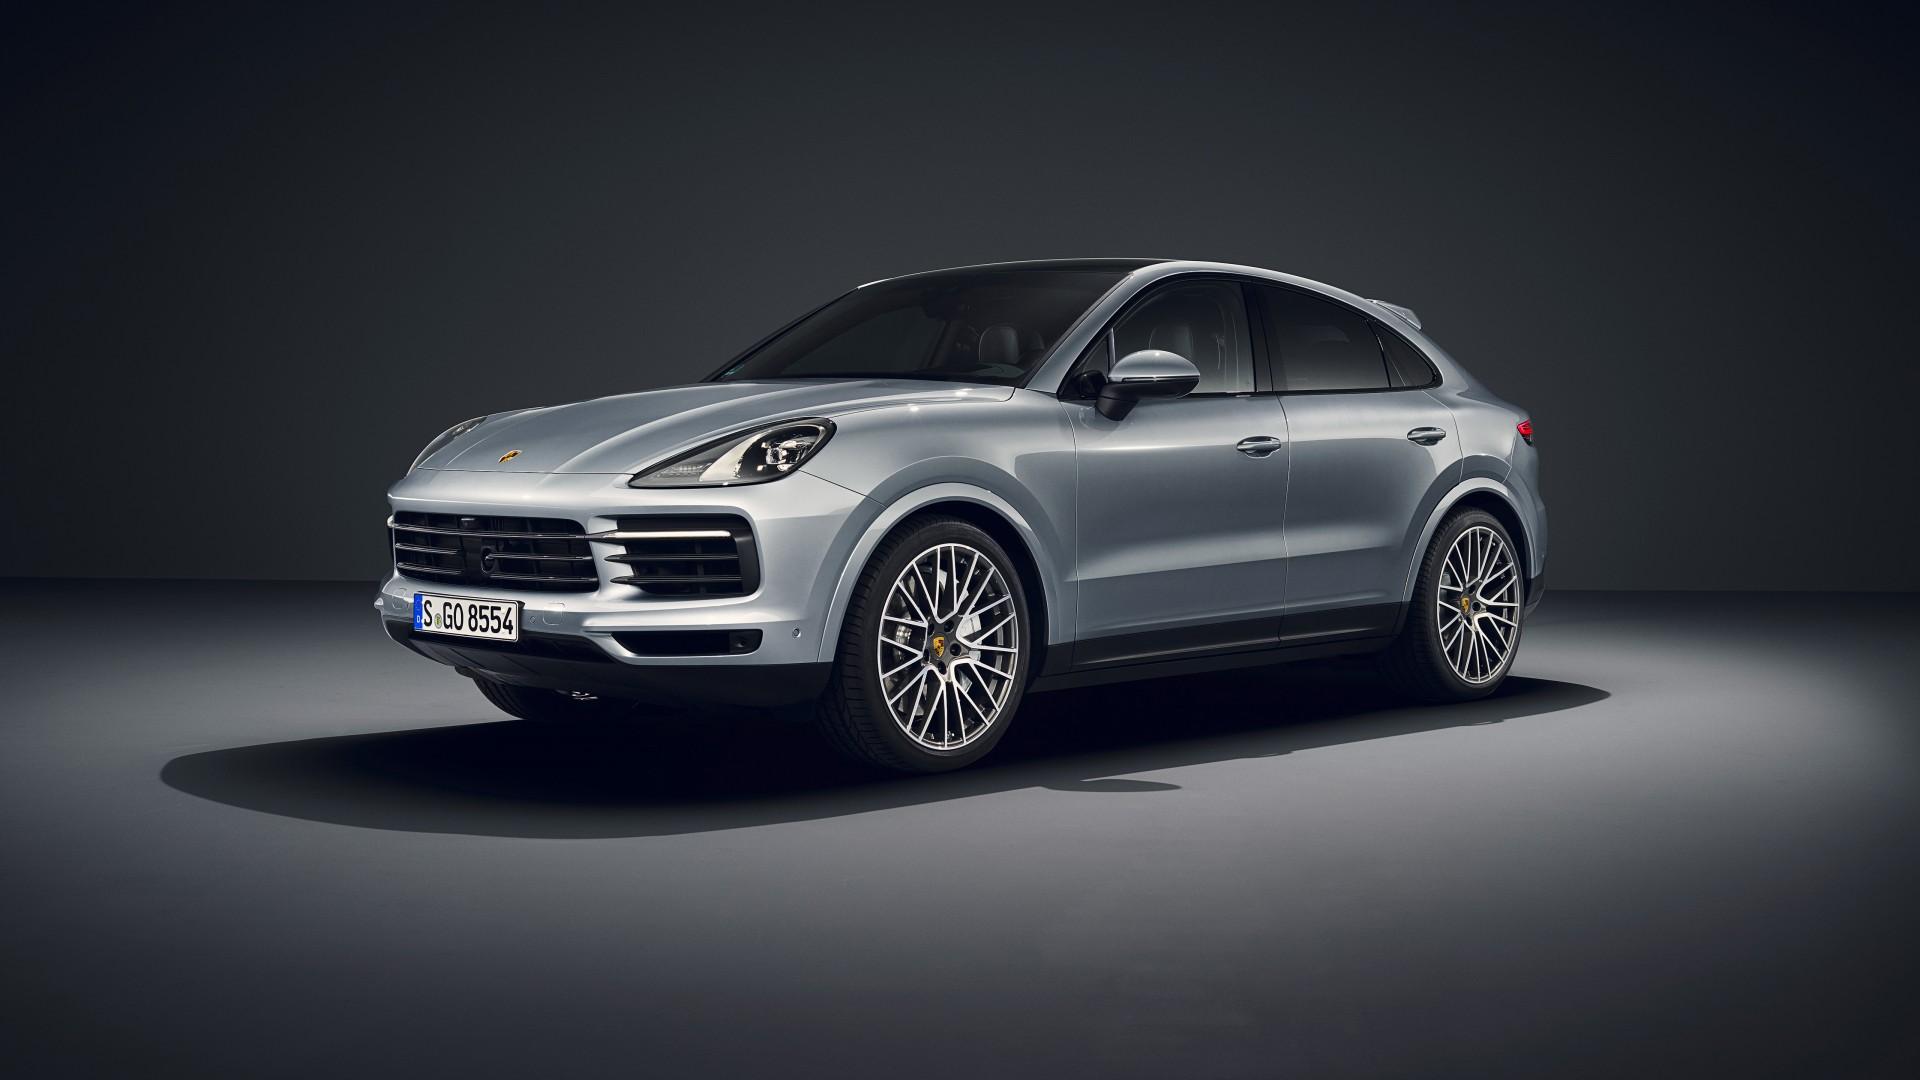 Porsche Cayenne S Coupe 2019 5k Wallpaper Hd Car